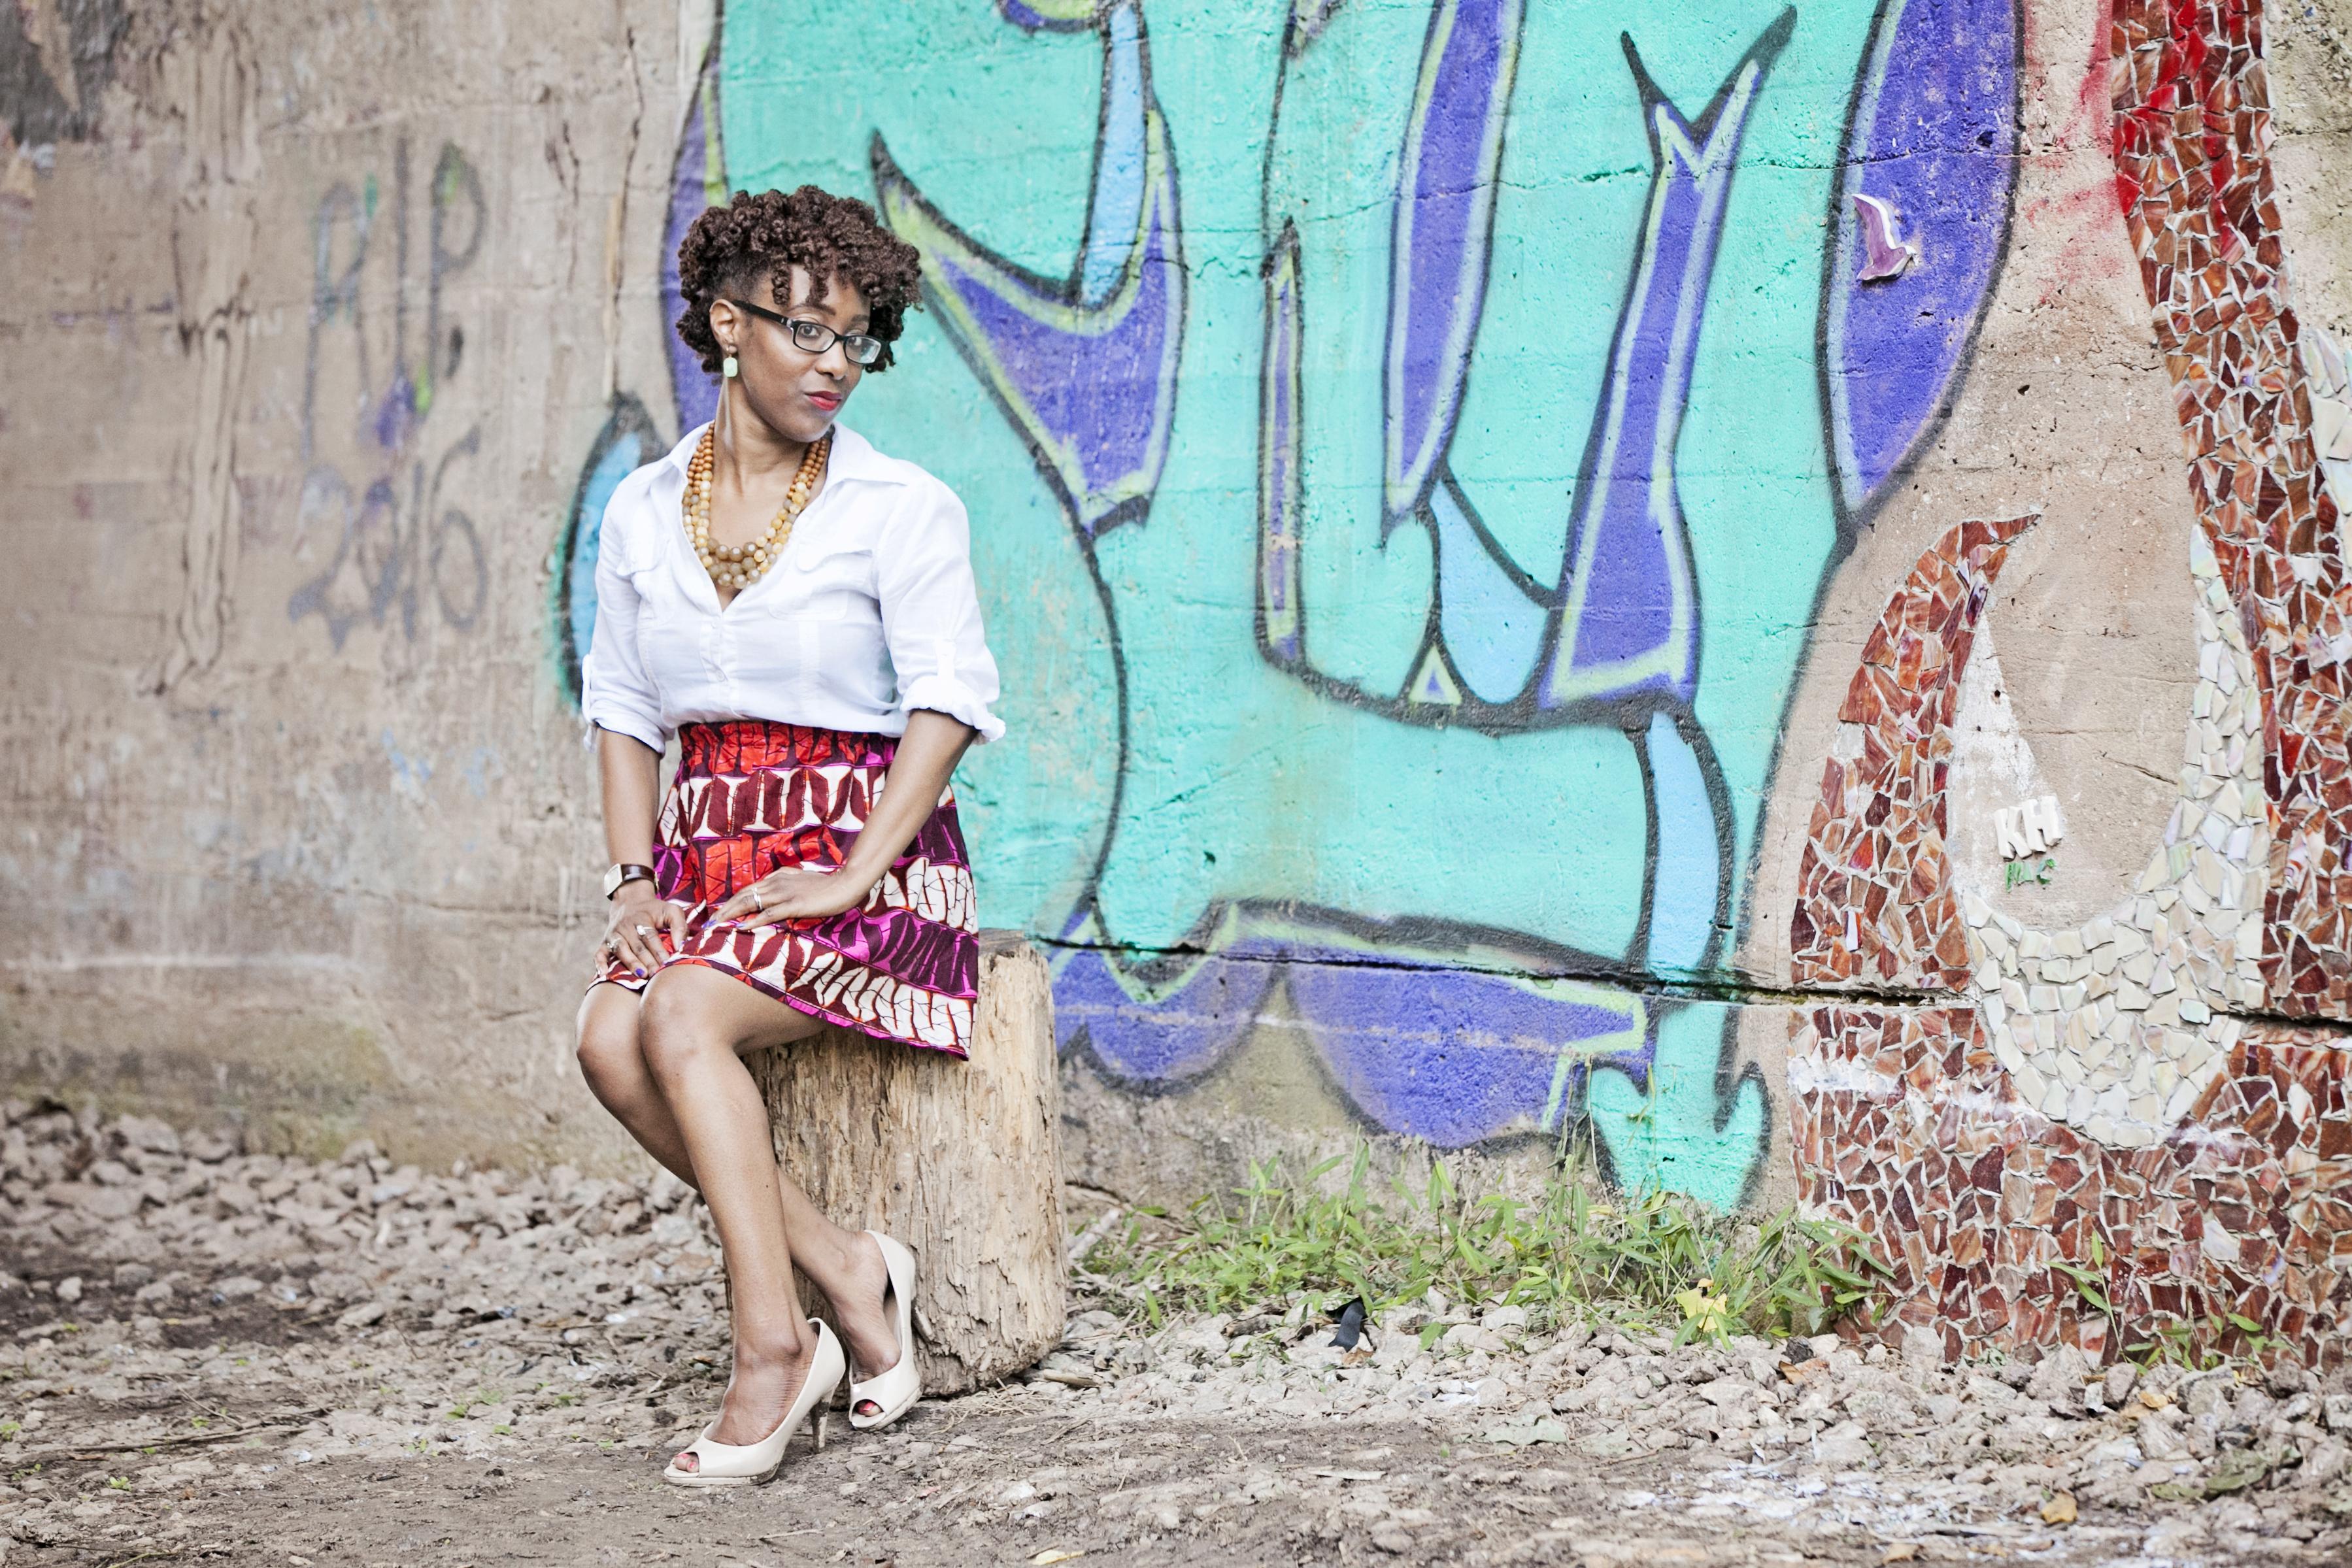 dara t  mathis   freelance writer and blogger